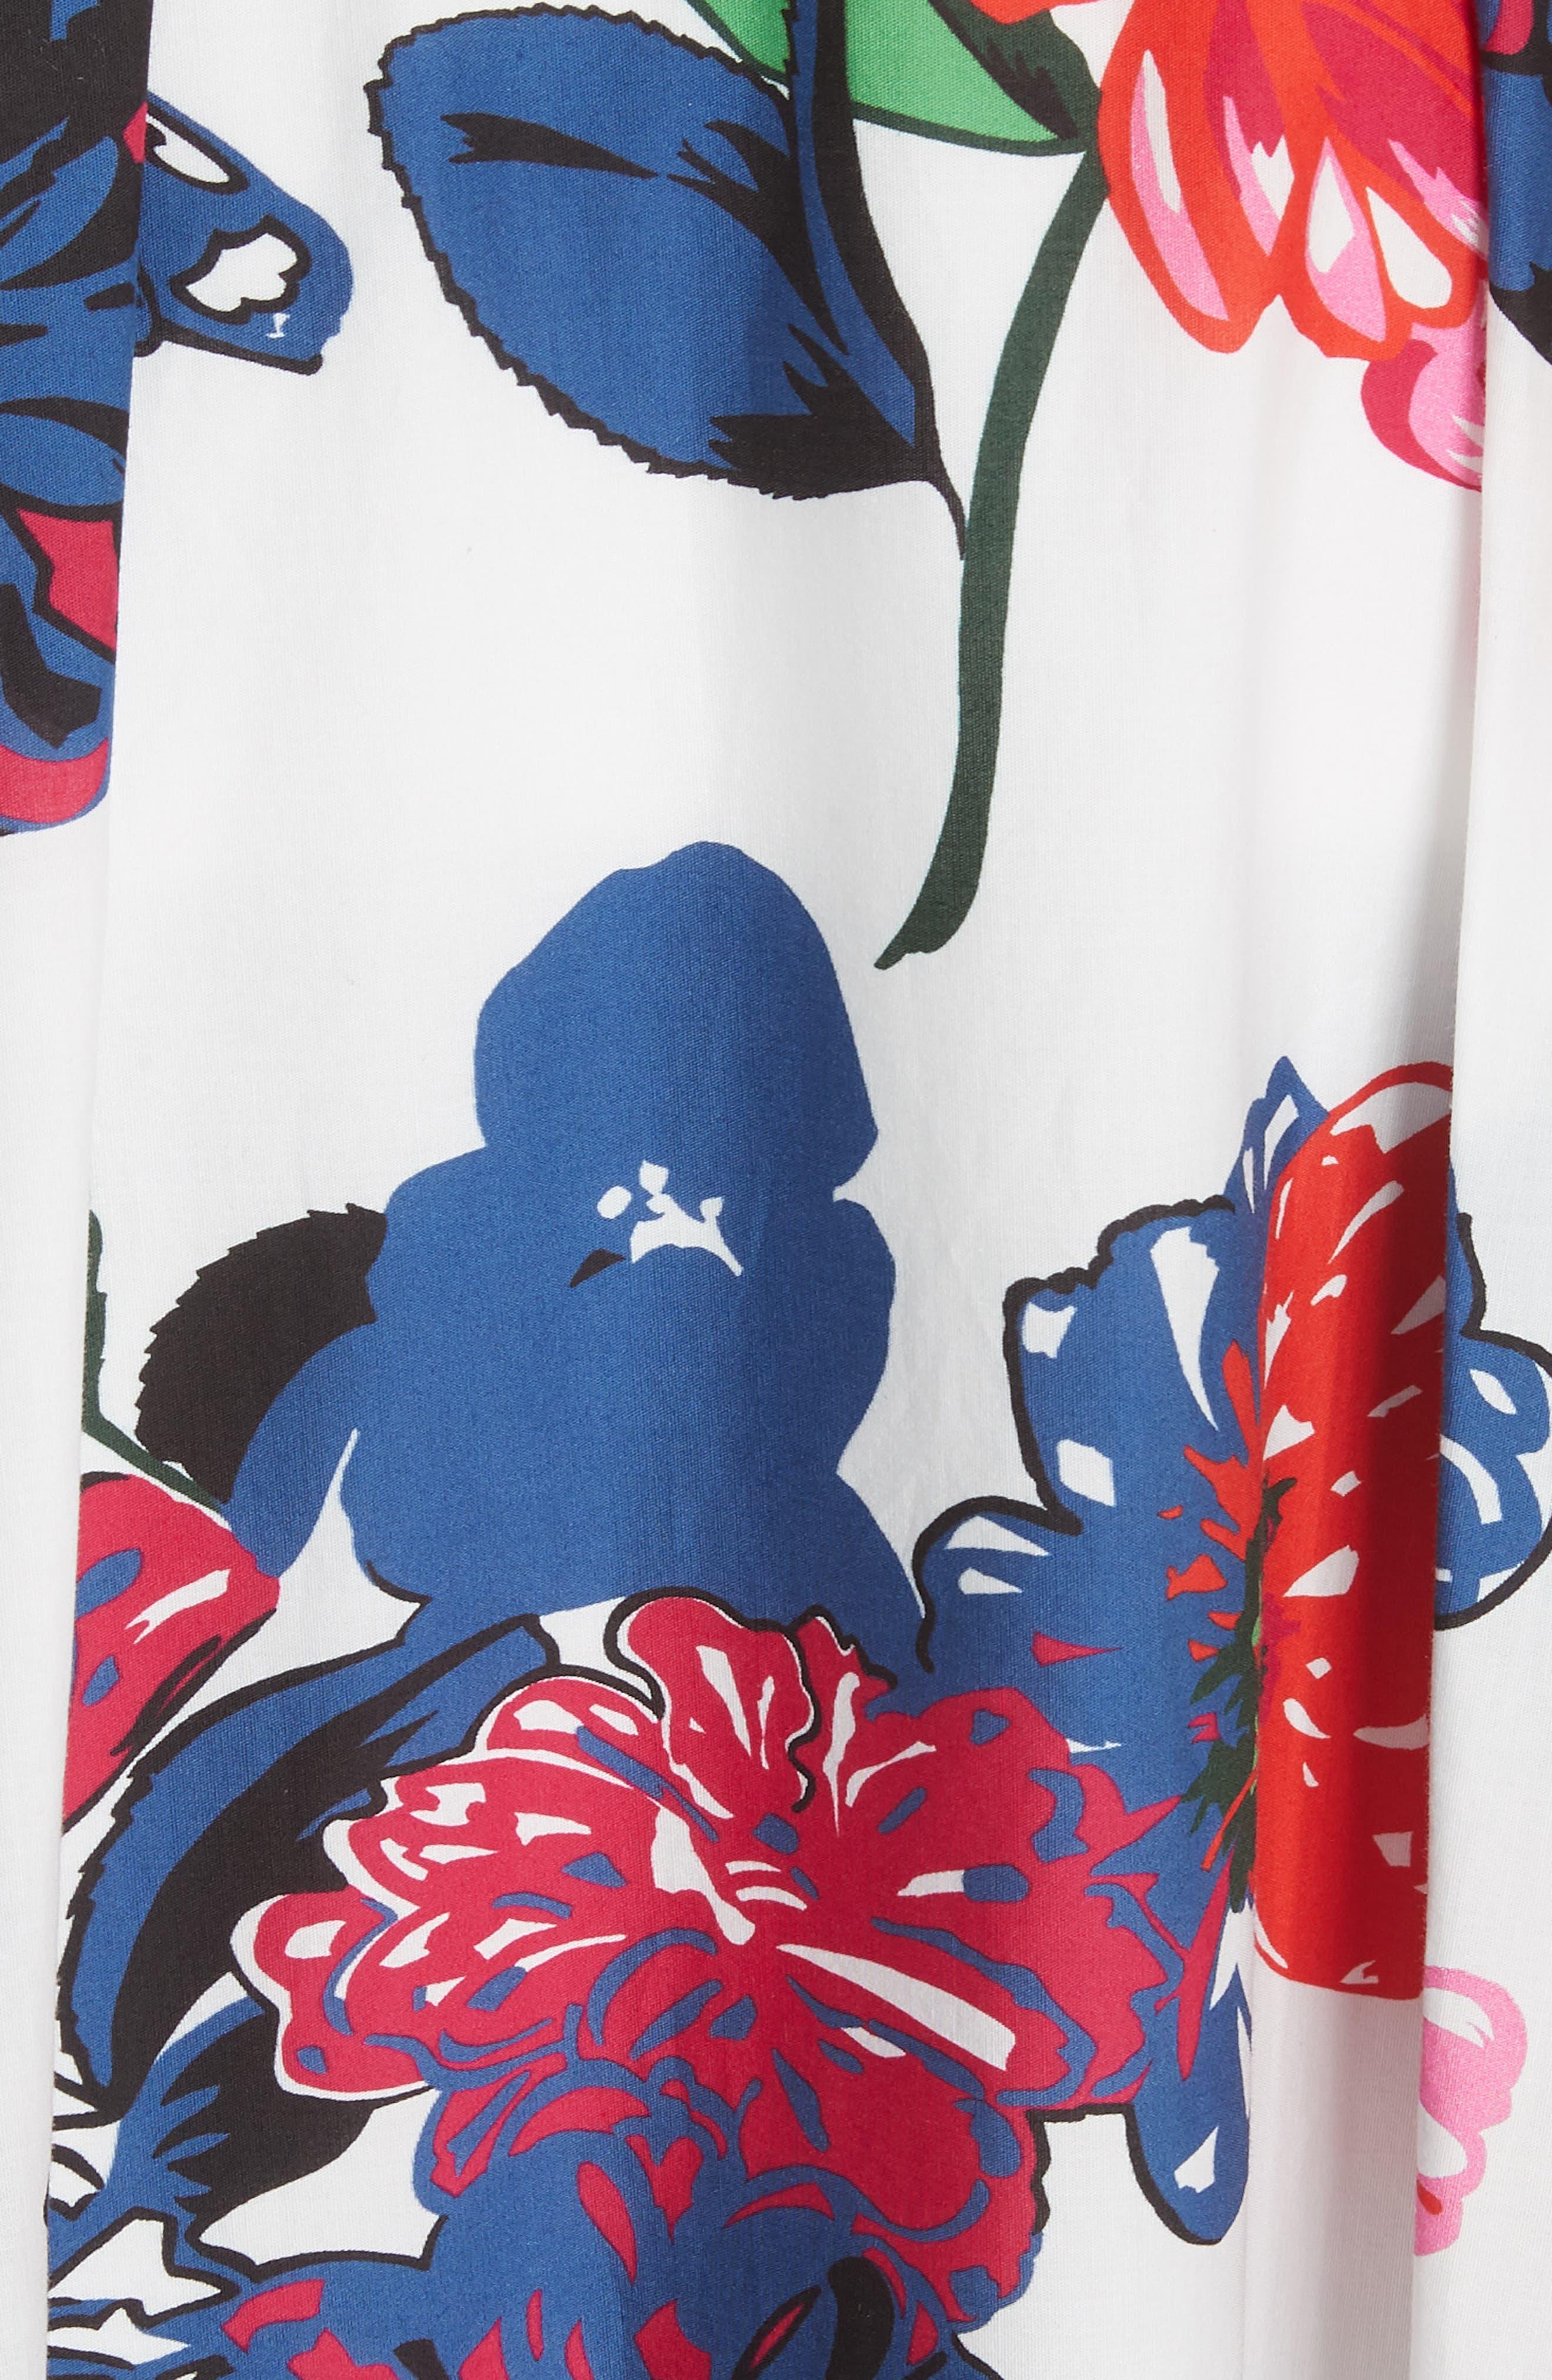 Floral Print Stretch Cotton Skirt,                             Alternate thumbnail 5, color,                             164